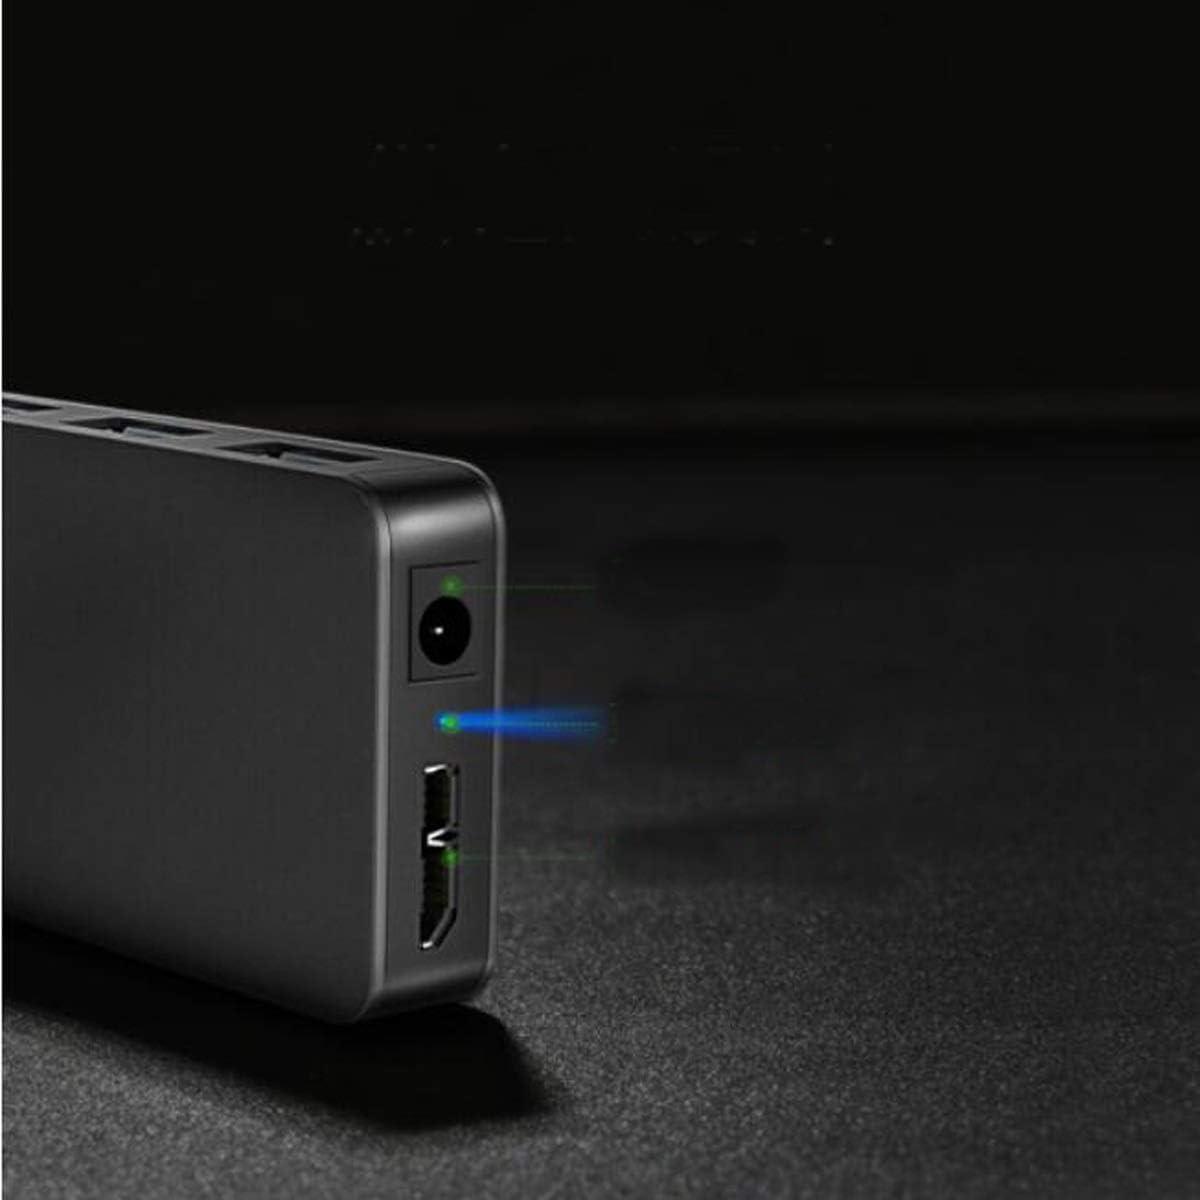 HUB Desktop Laptop One for Four USB Splitter High-Speed Expansion of 4-Port Hub Color : Black Corrosion Protection Hongyushanghang Hub Black